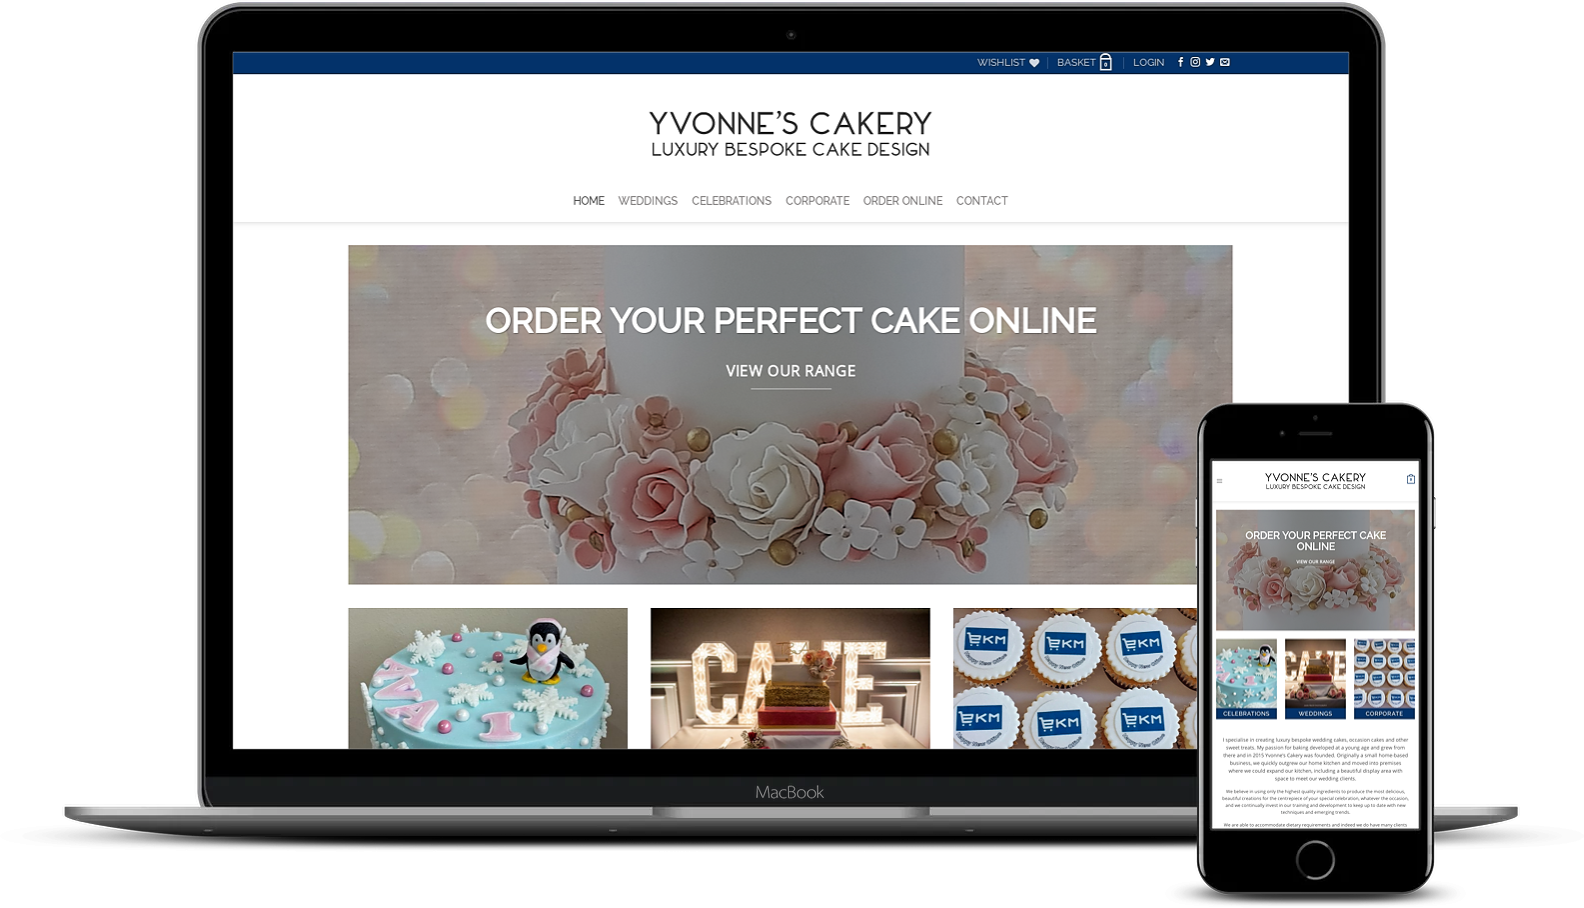 Yvonne's Cakery Macclesfield eCommerce website